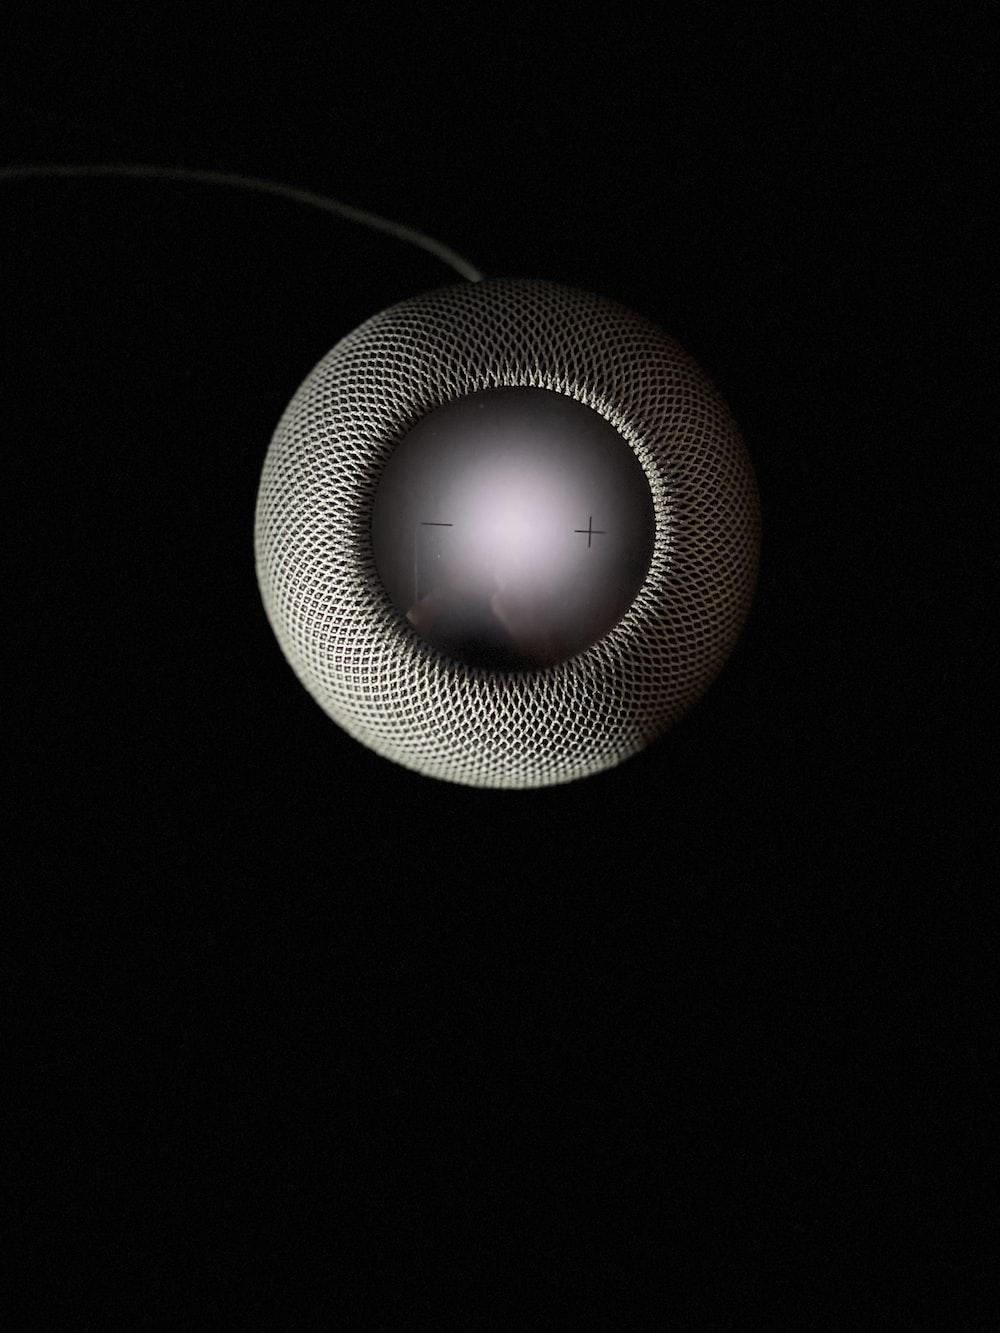 round white and black portable speaker